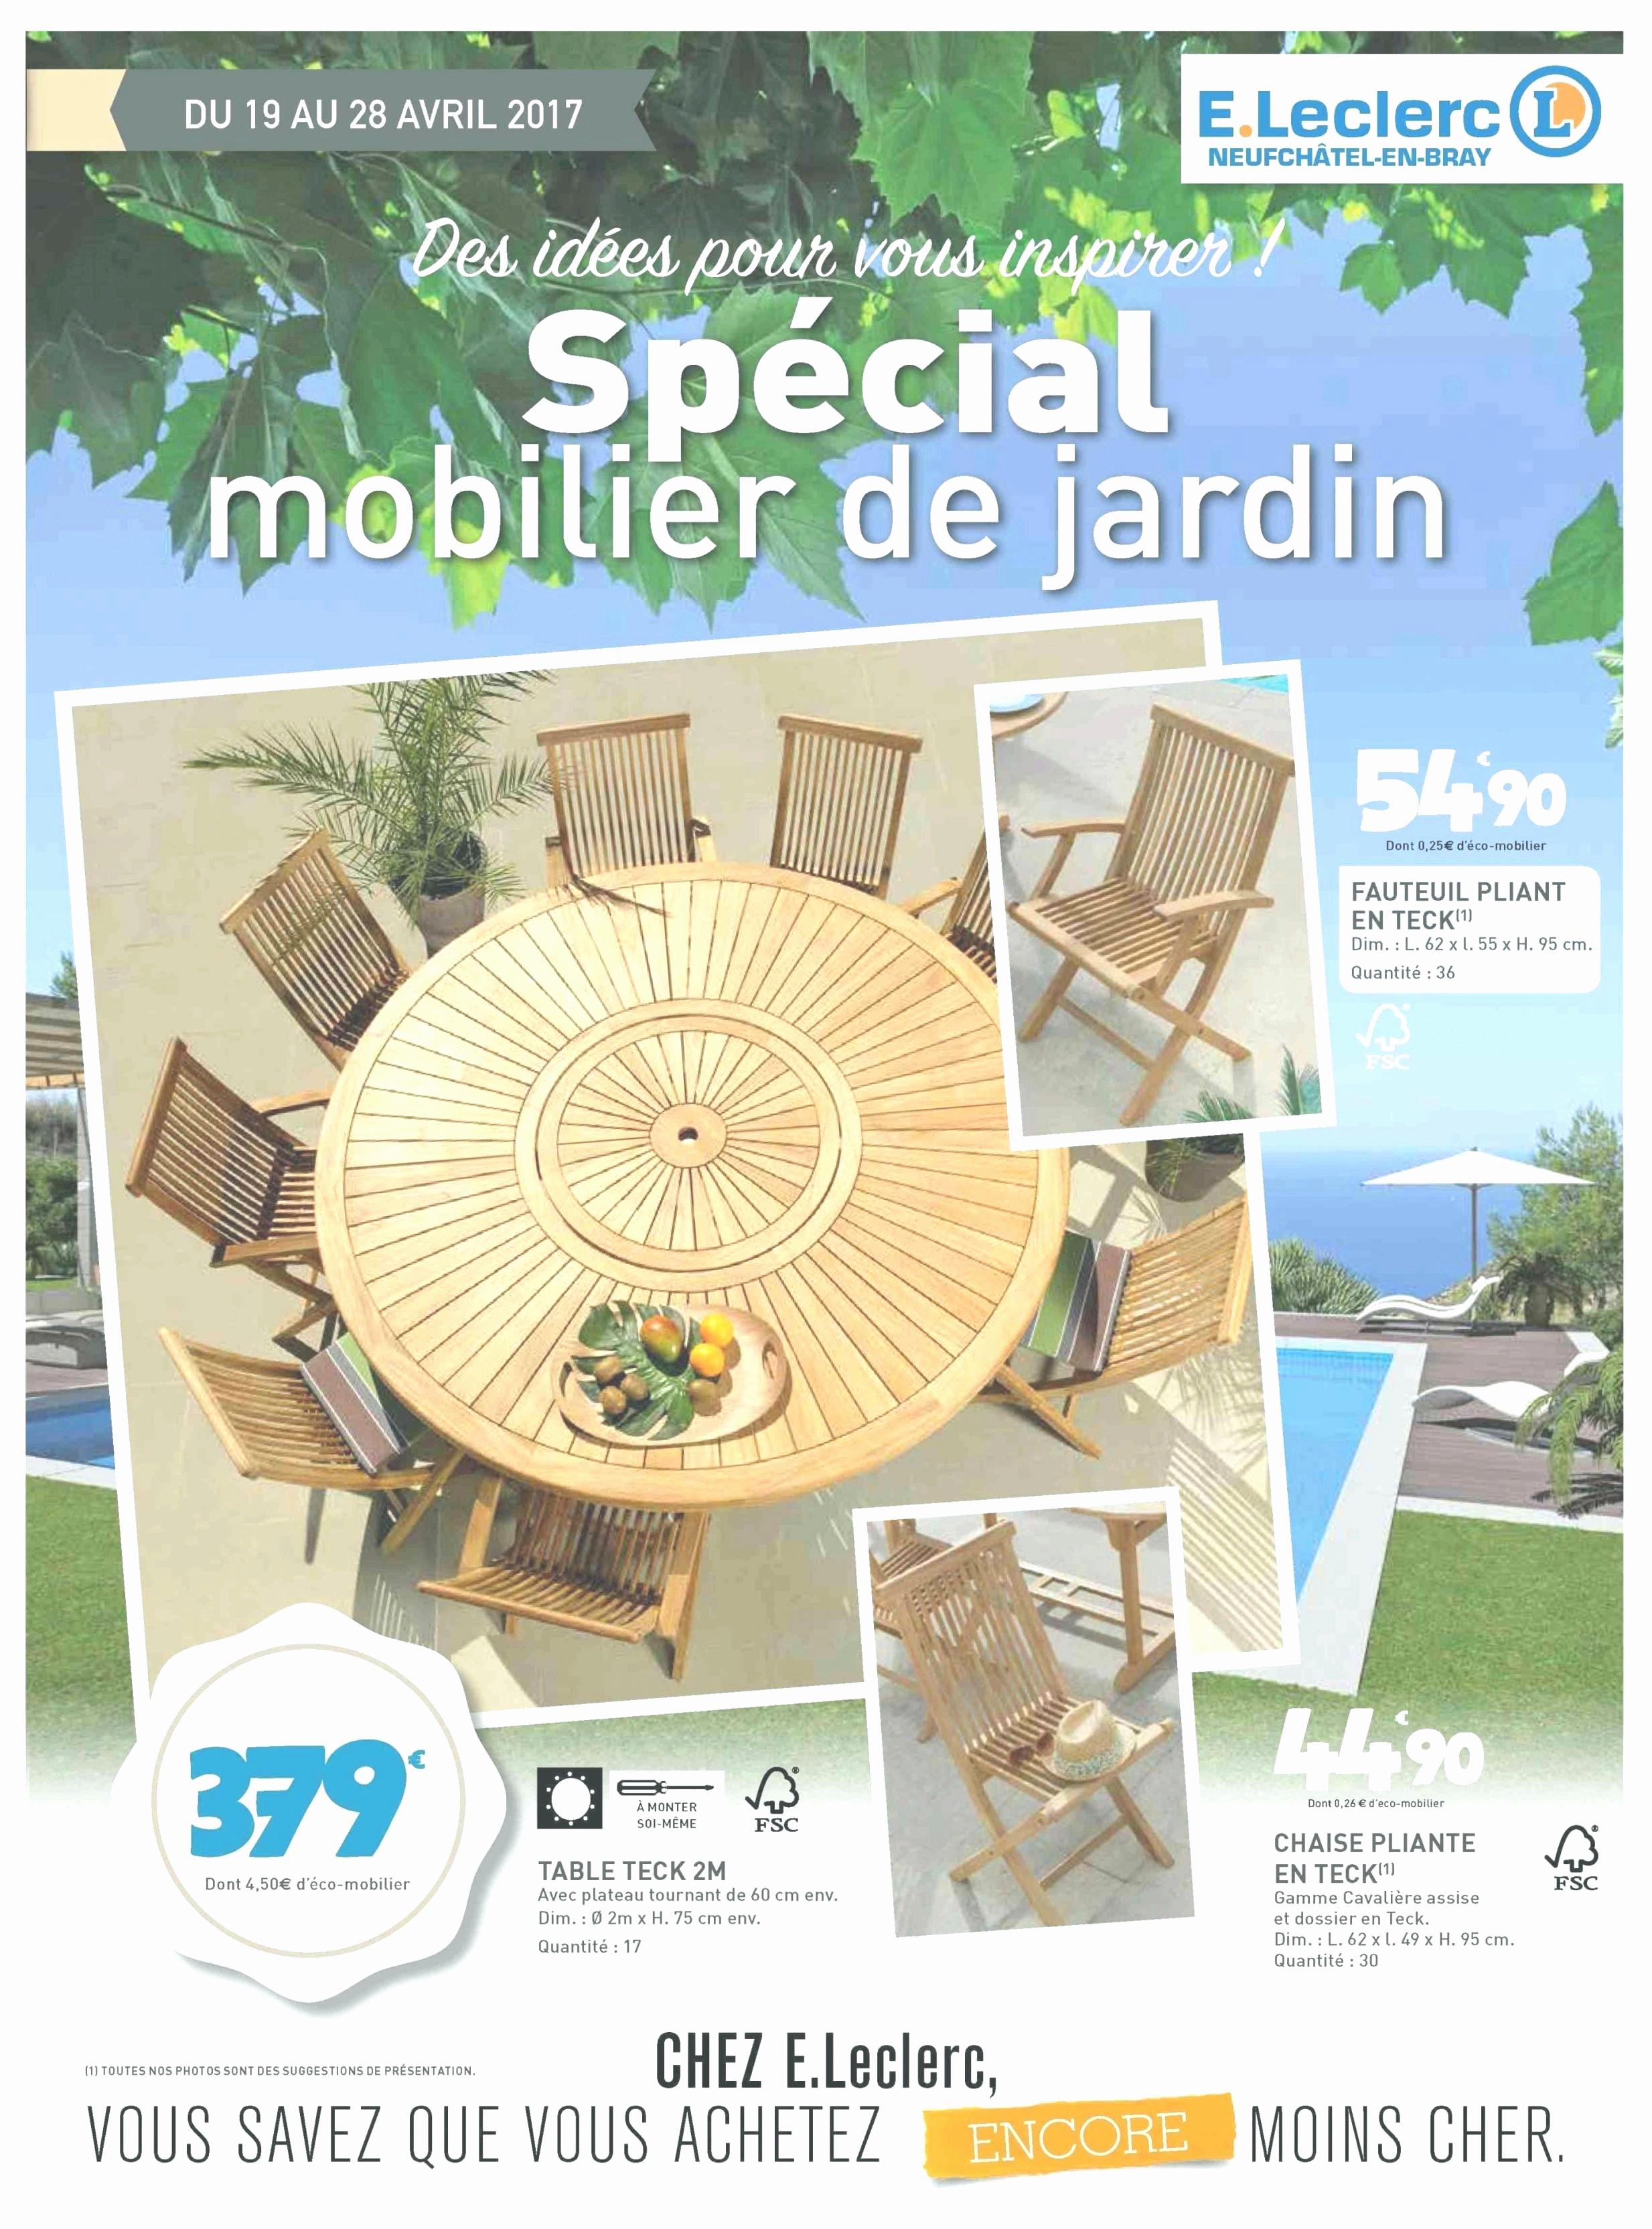 Salon Jardin Cdiscount Luxe Photos Salon De Jardin Plet Pas Cher Génial Table De Jardin Resine